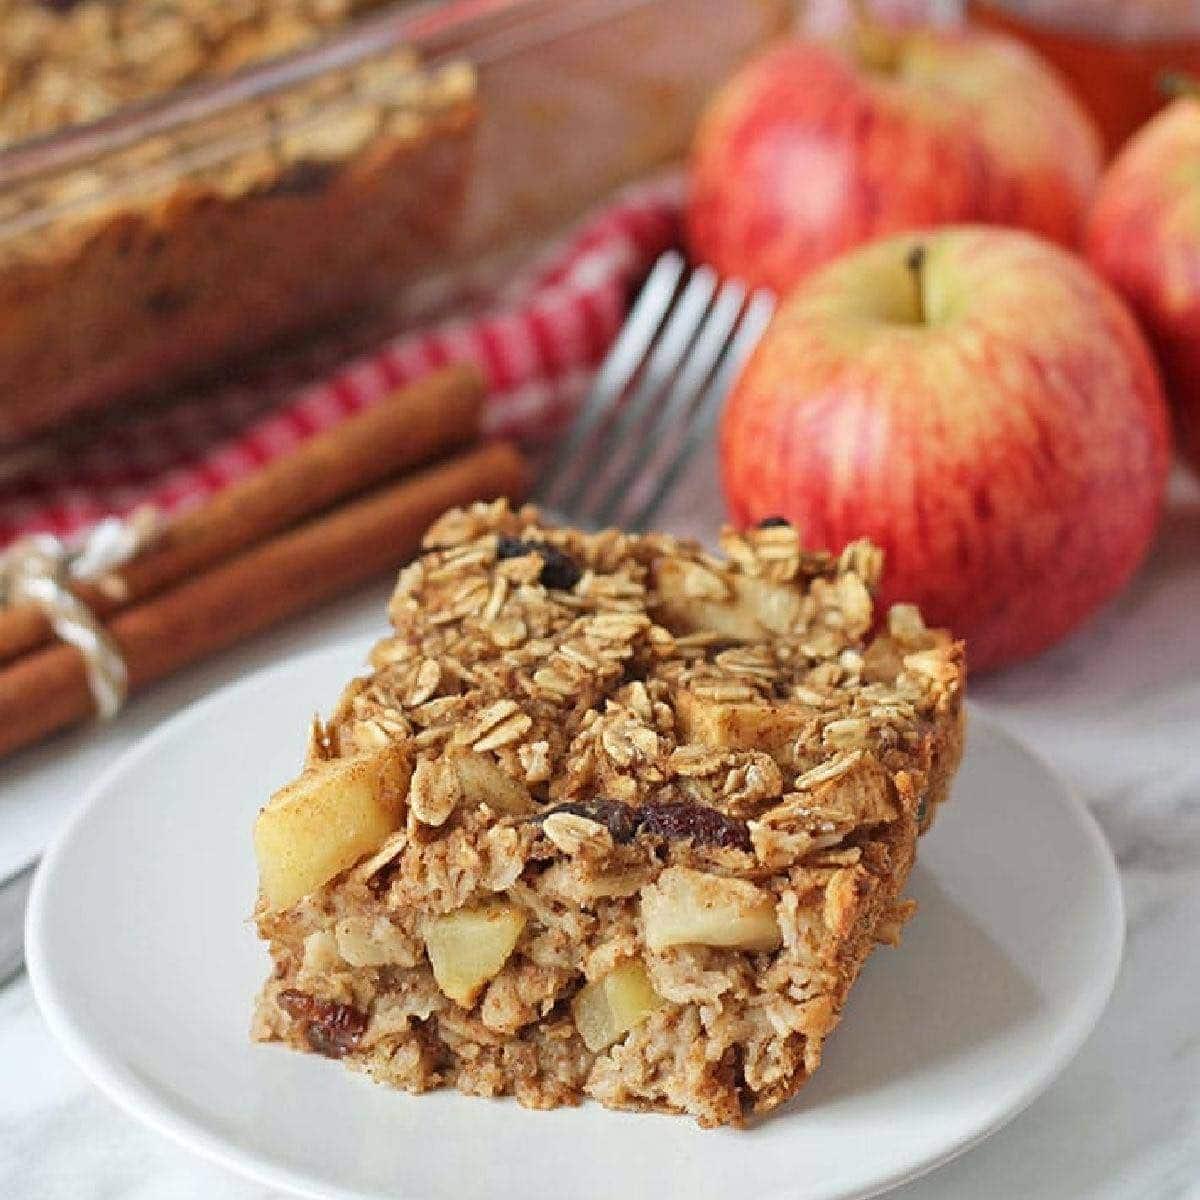 Plant-Based Breakfast Ideas photo of a plate of Apple Cinnamon Baked Oatmeal.